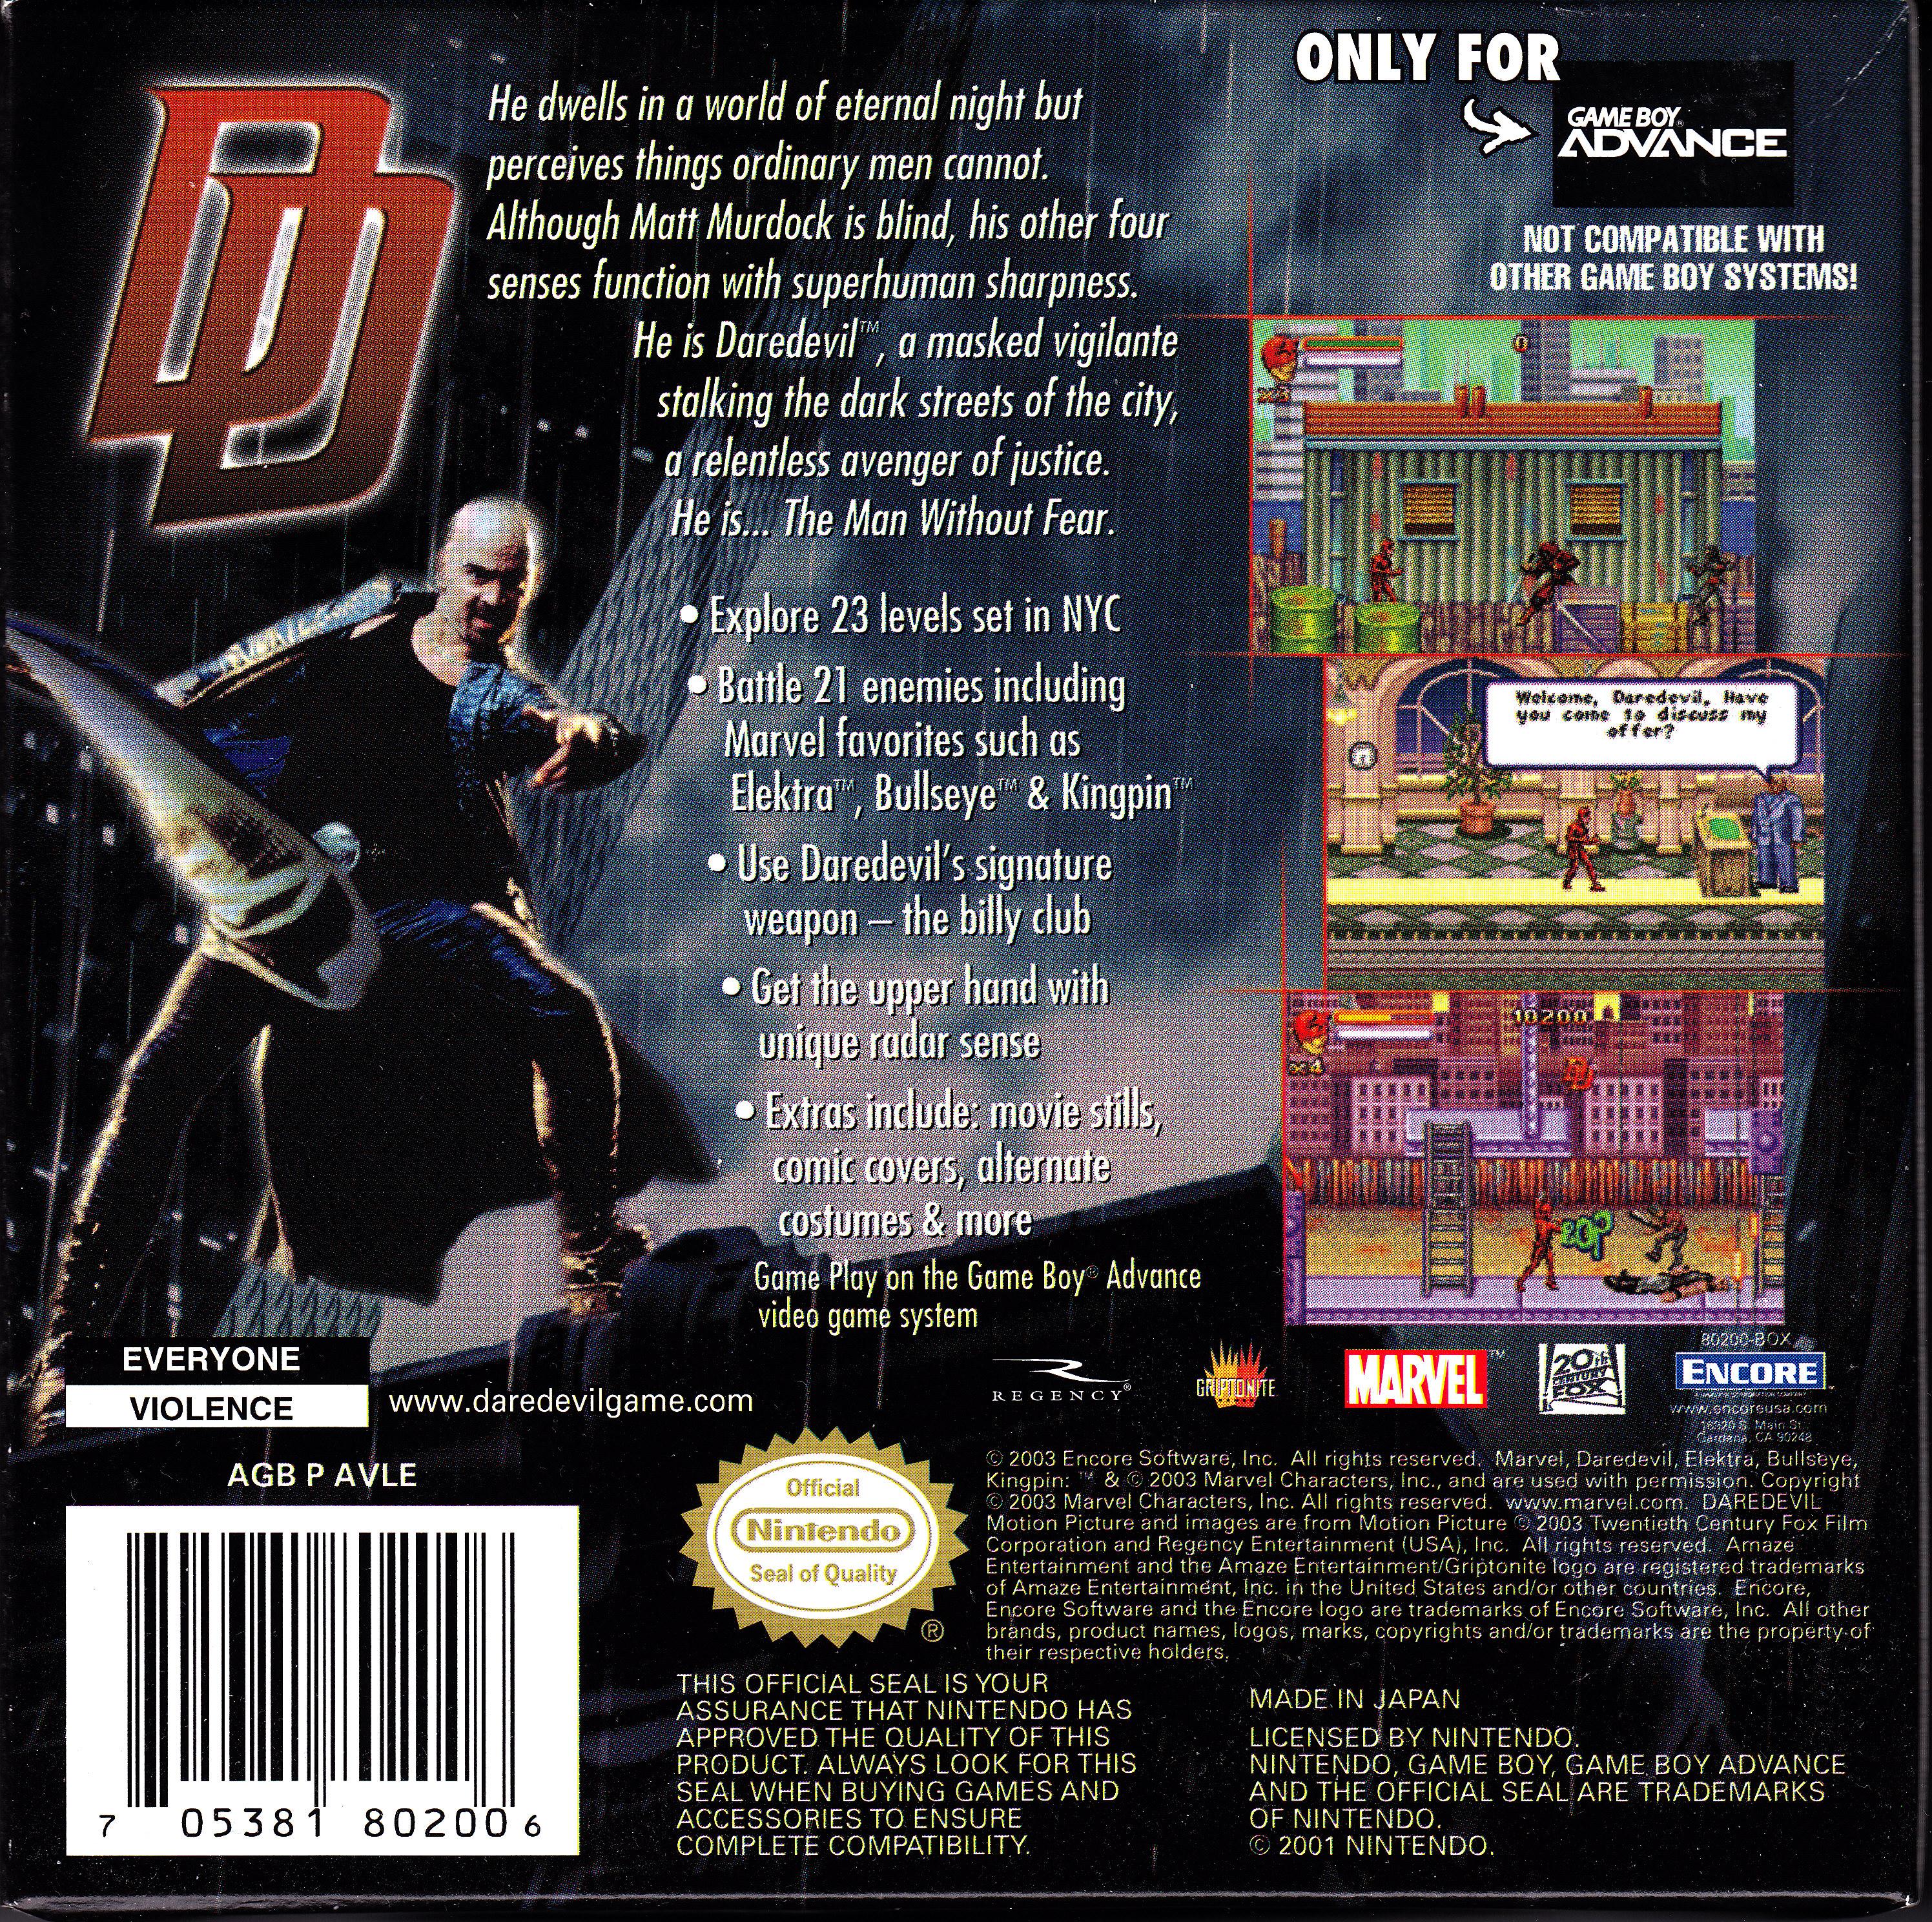 Daredevil Game Boy Advance Game Boy Advance Daredevil